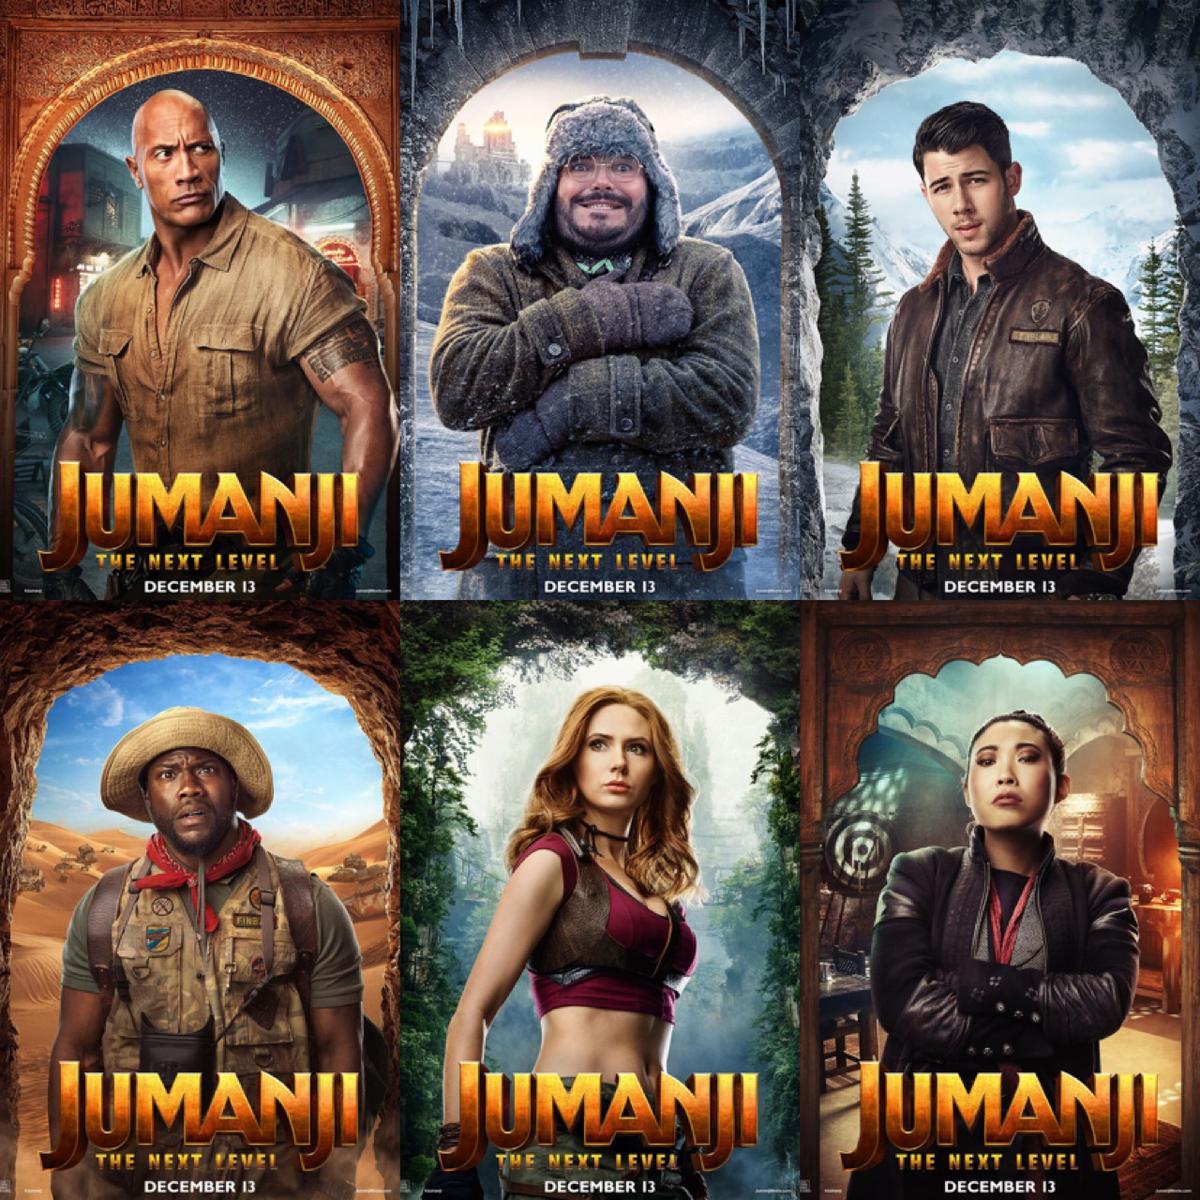 Eng Sub Jumanji The Next Level Full Movie Maxhd Online 2019 Free Download 720p Novi2205 S Blog